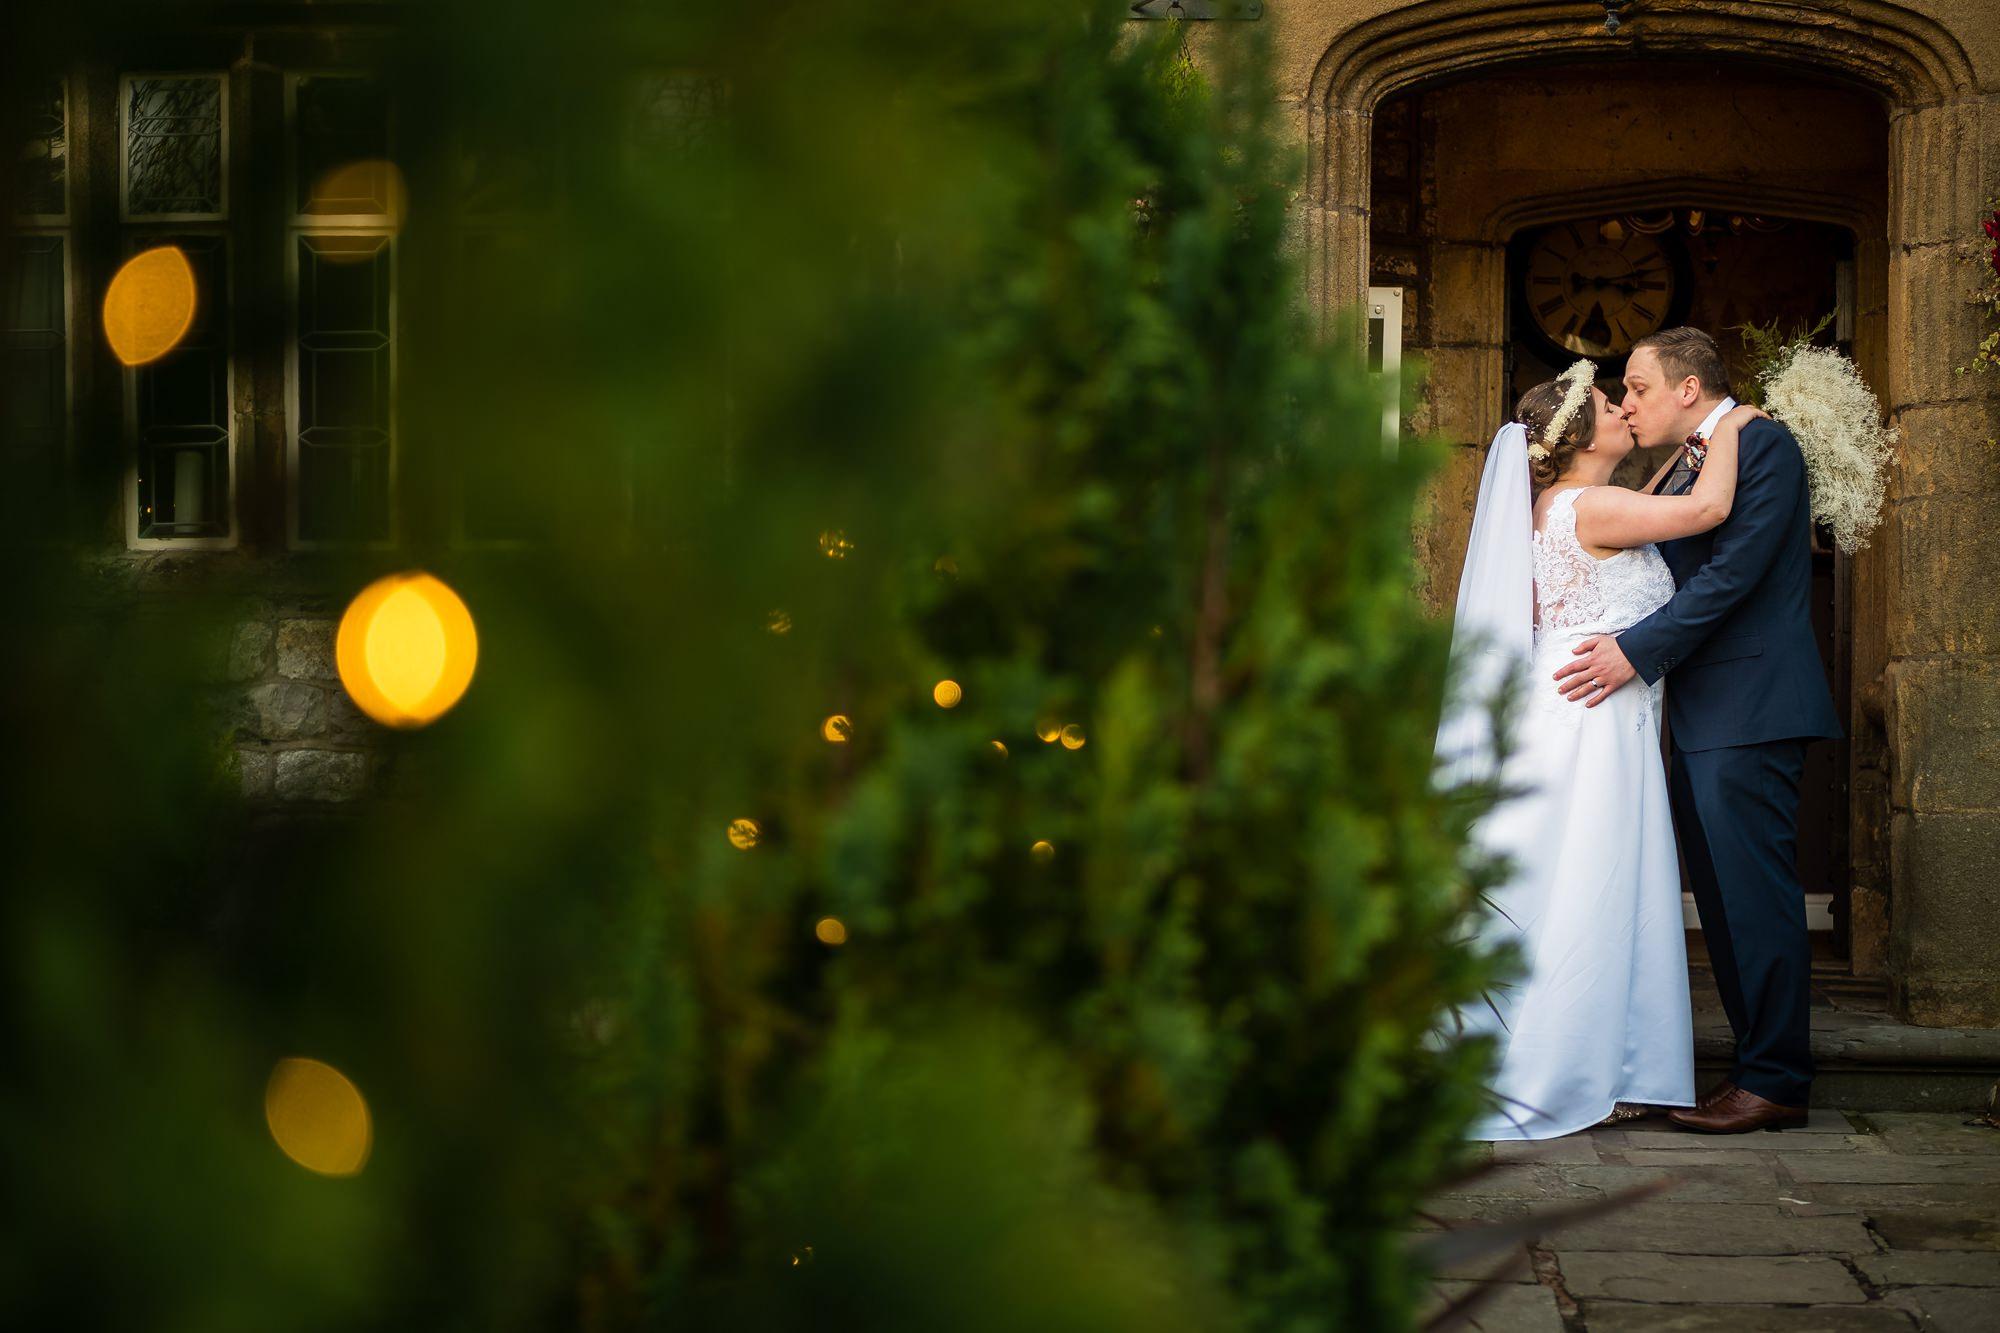 natural wedding photography at stirk house, lancashire